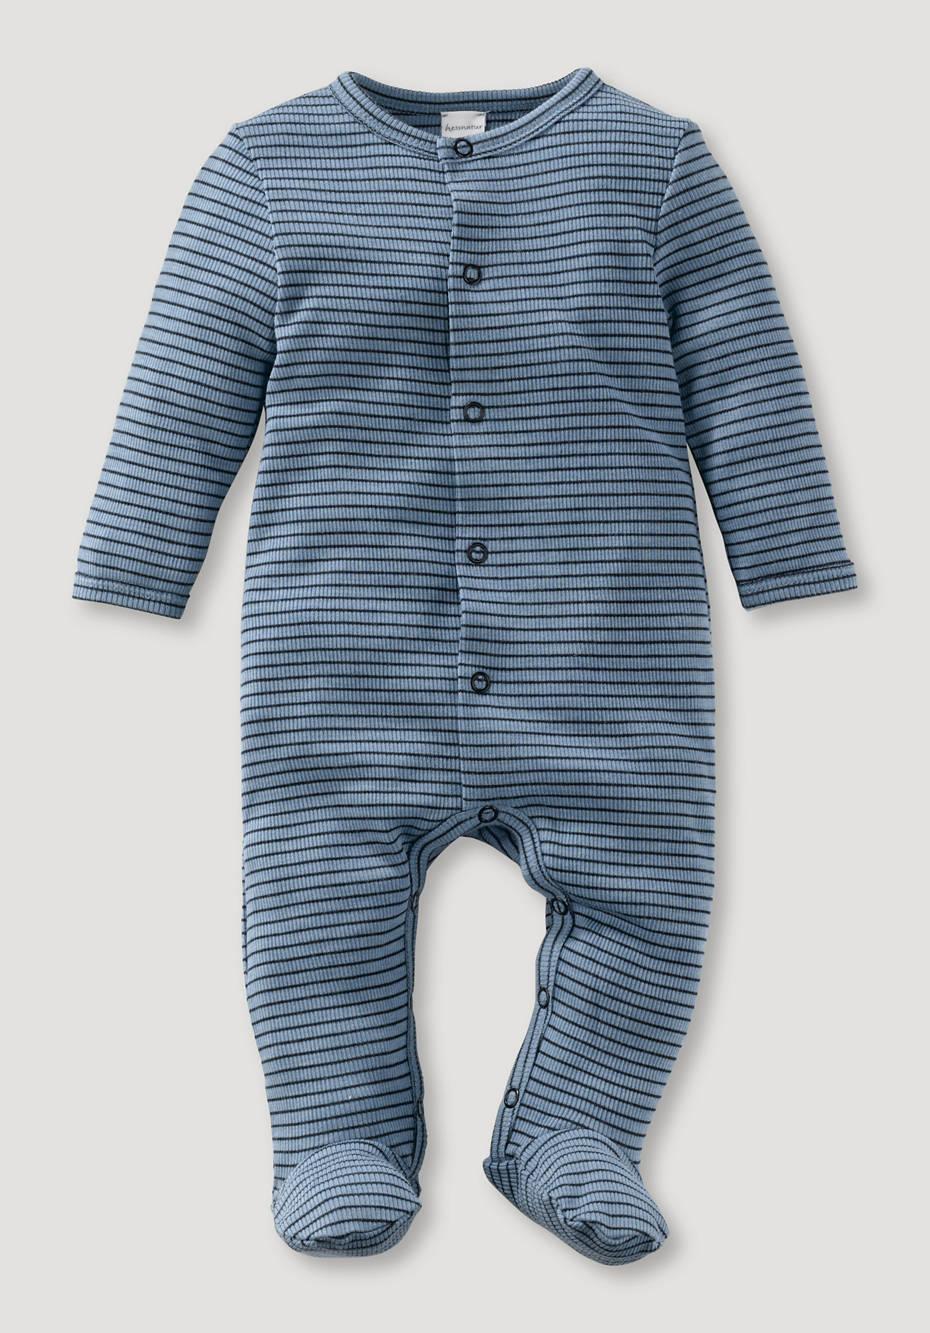 Sleep overall made of organic merino wool and silk